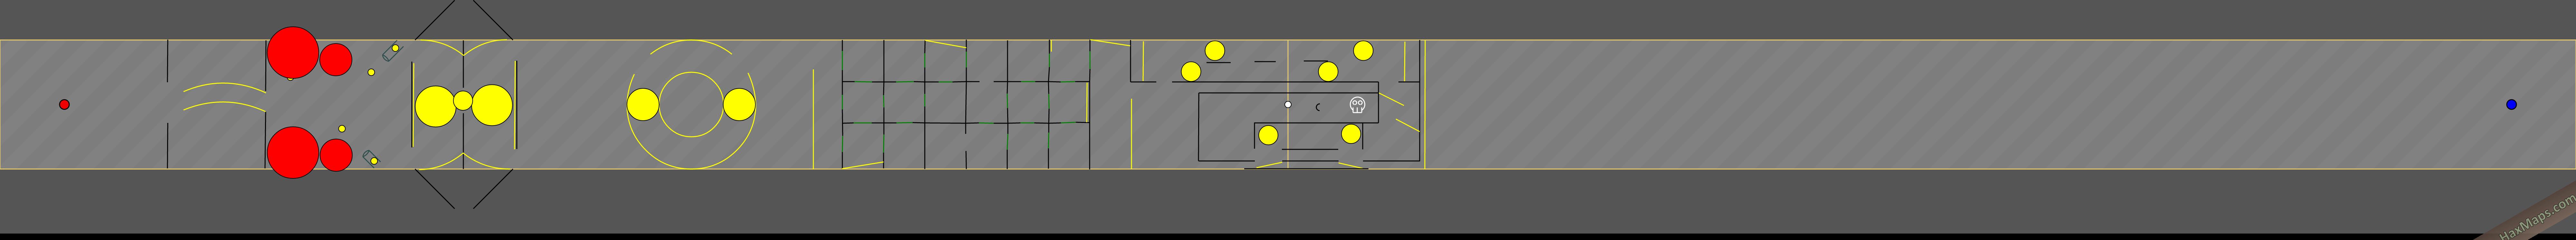 hax ball maps   Yellow Easy